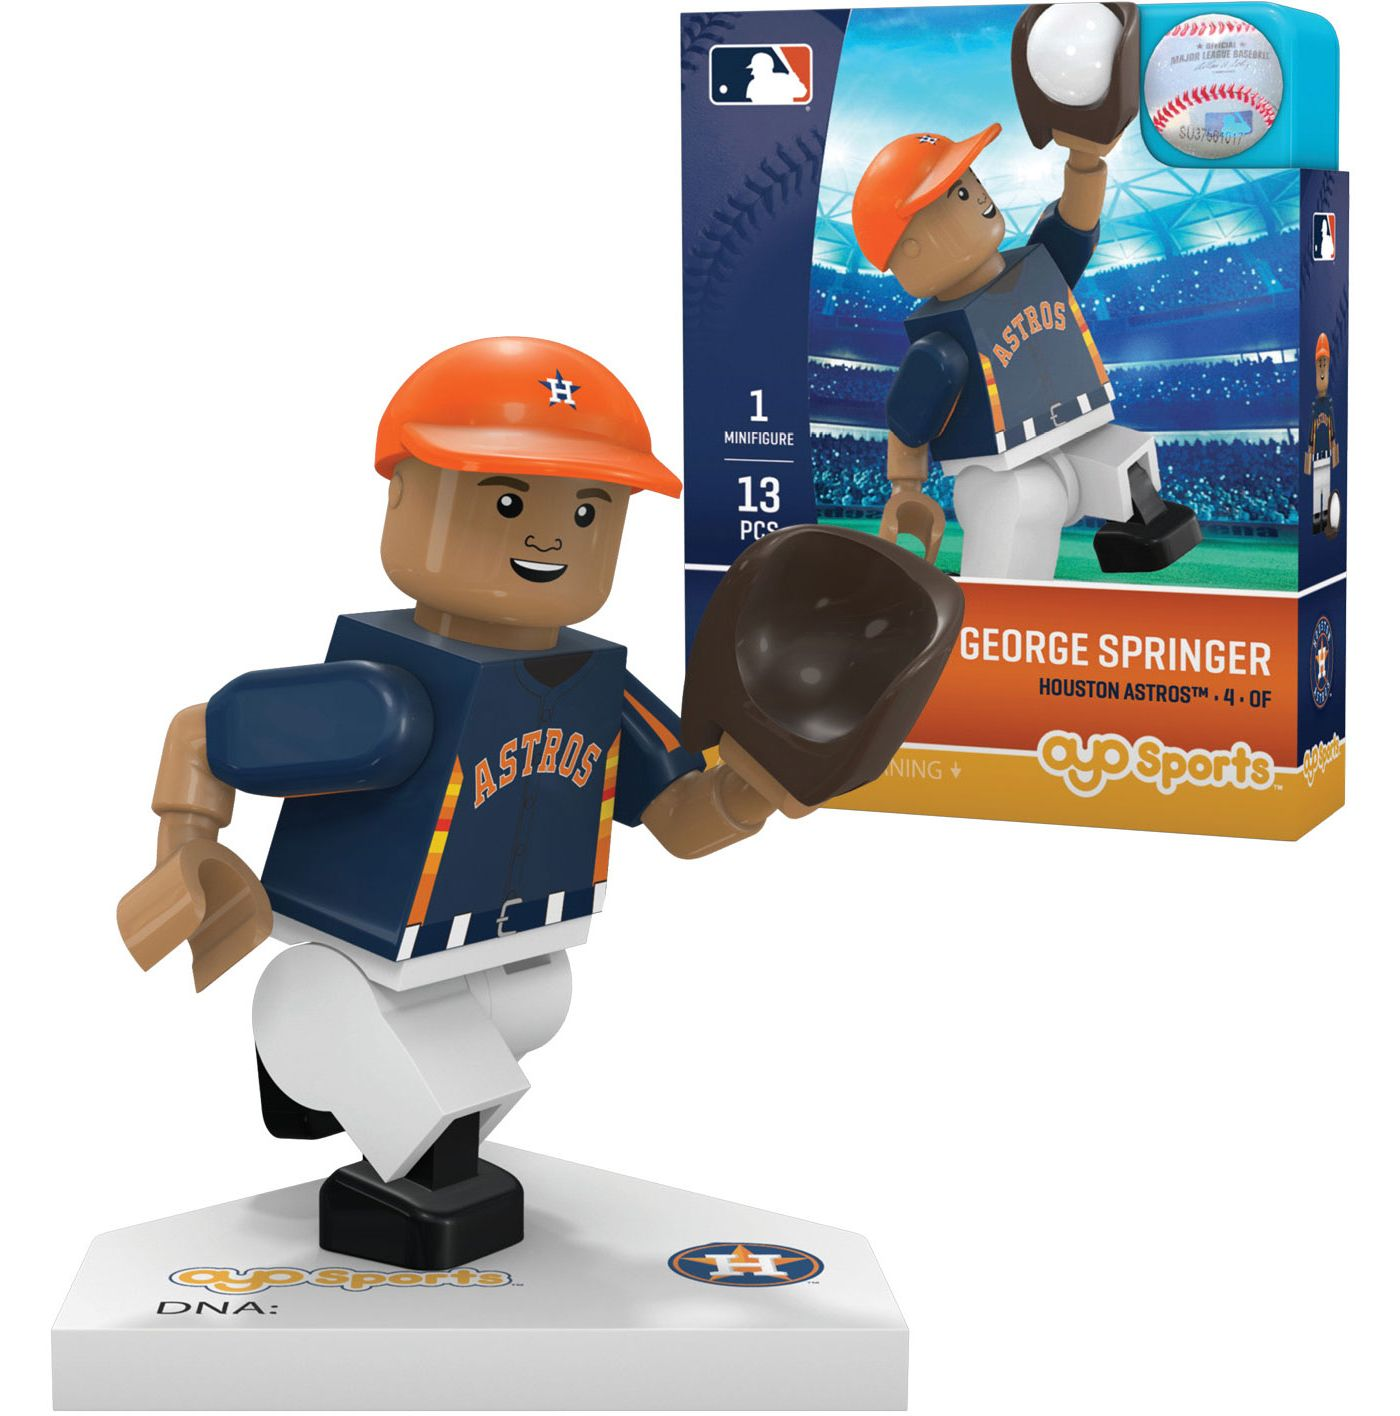 Oyo Houston Astros George Springer Figurine